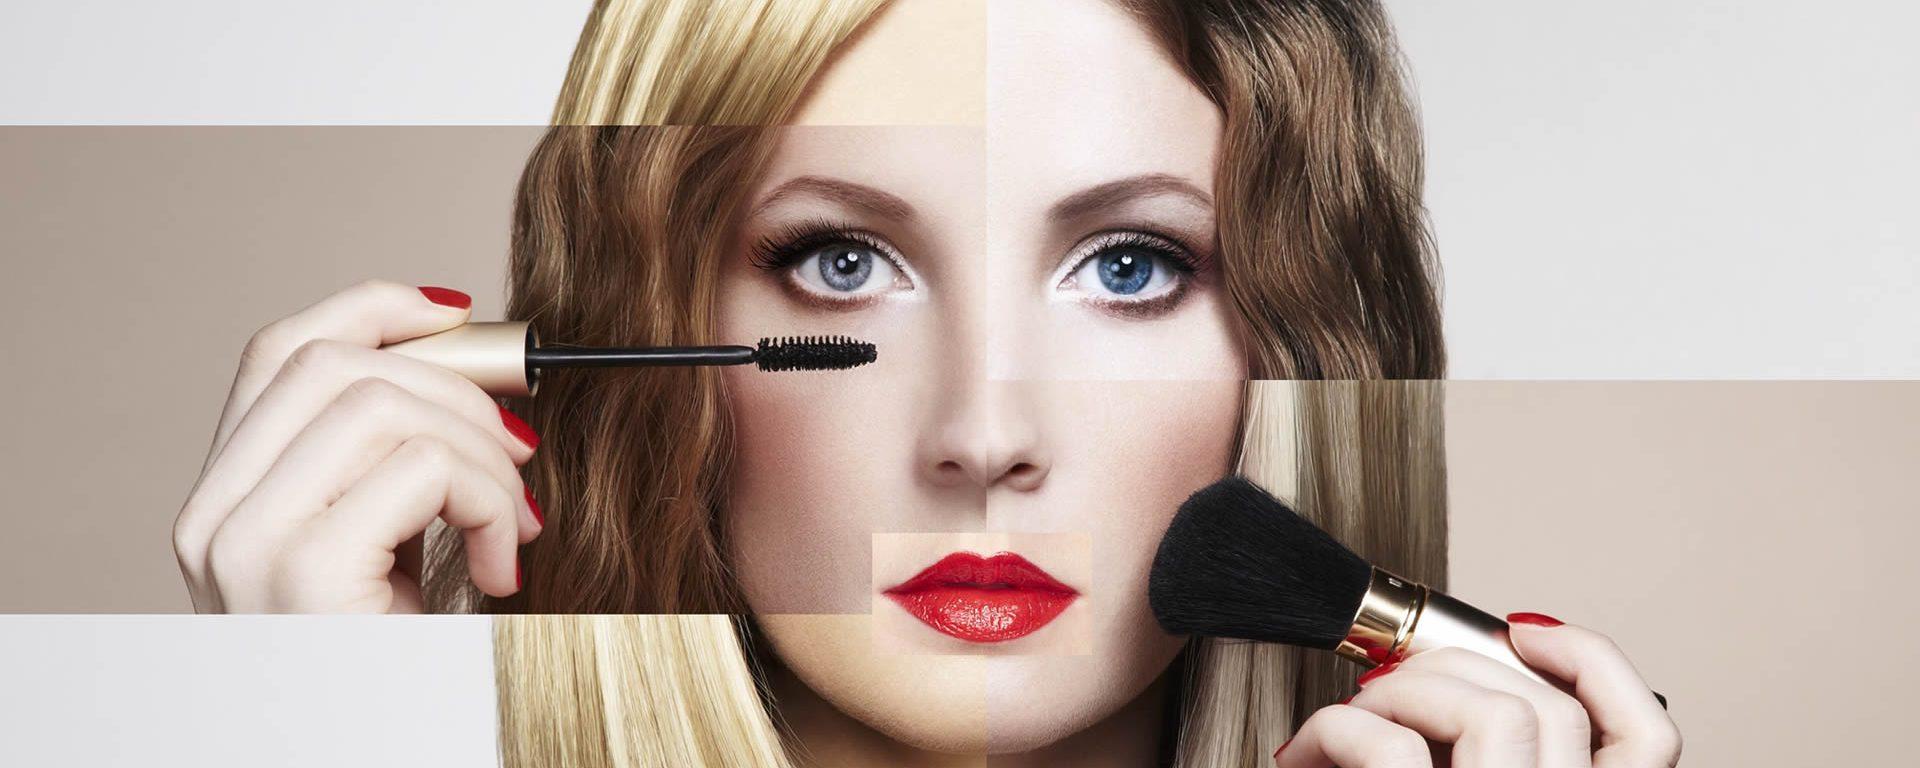 makeup-greenpeace